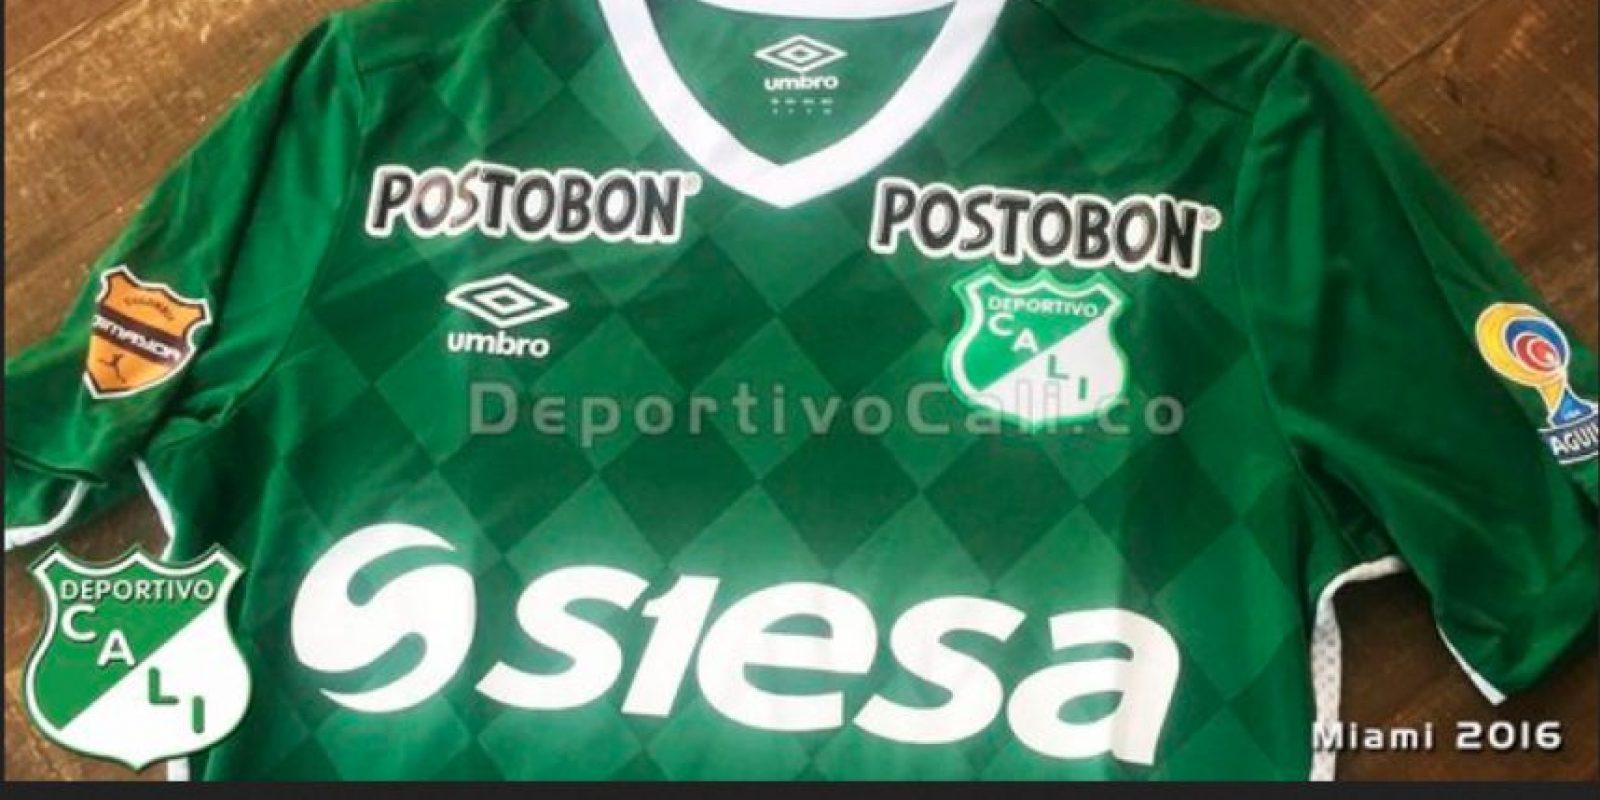 eda6e8ec9fbd2 Así será la camiseta del Deportivo Cali para 2016